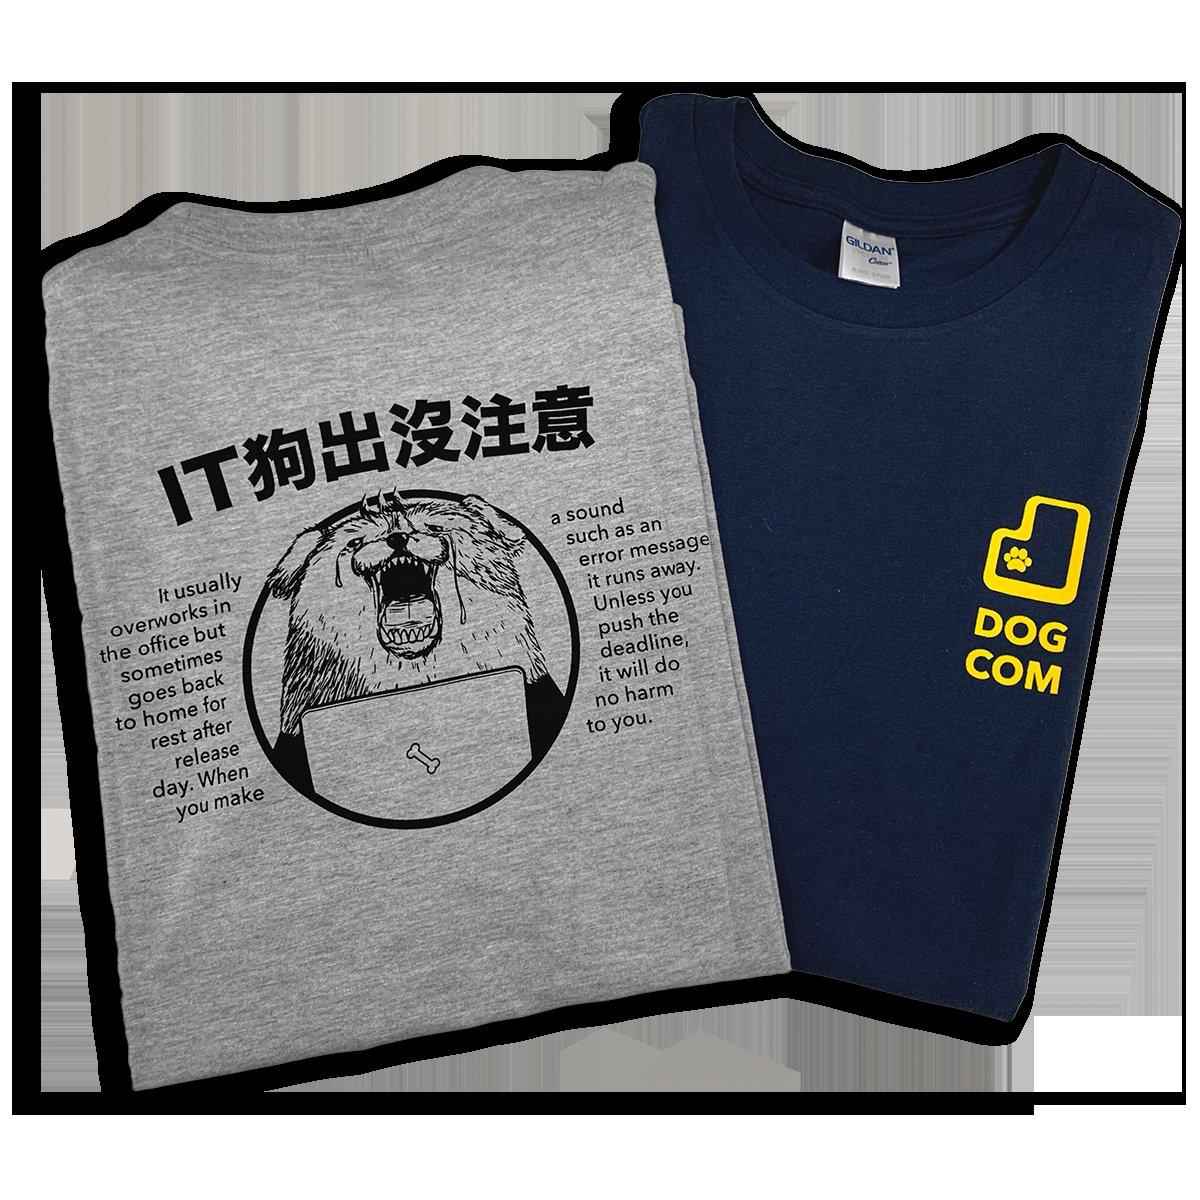 IT狗出沒注意(海軍藍)S號-preview-7